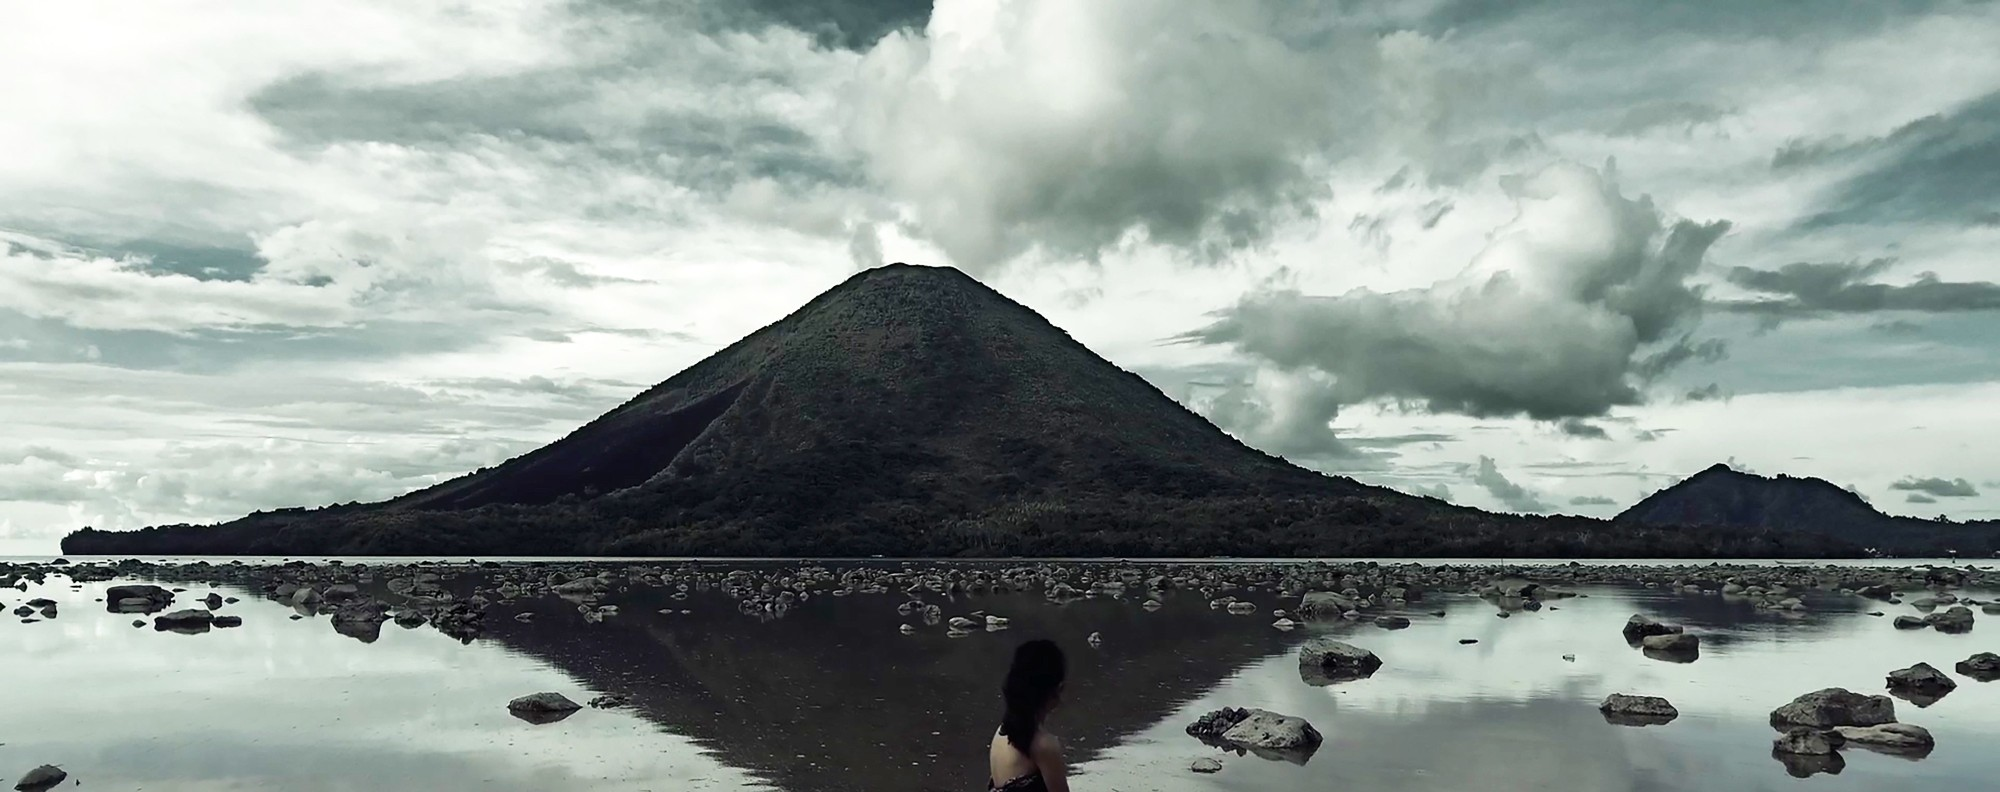 The Banda Islands. Handout photo